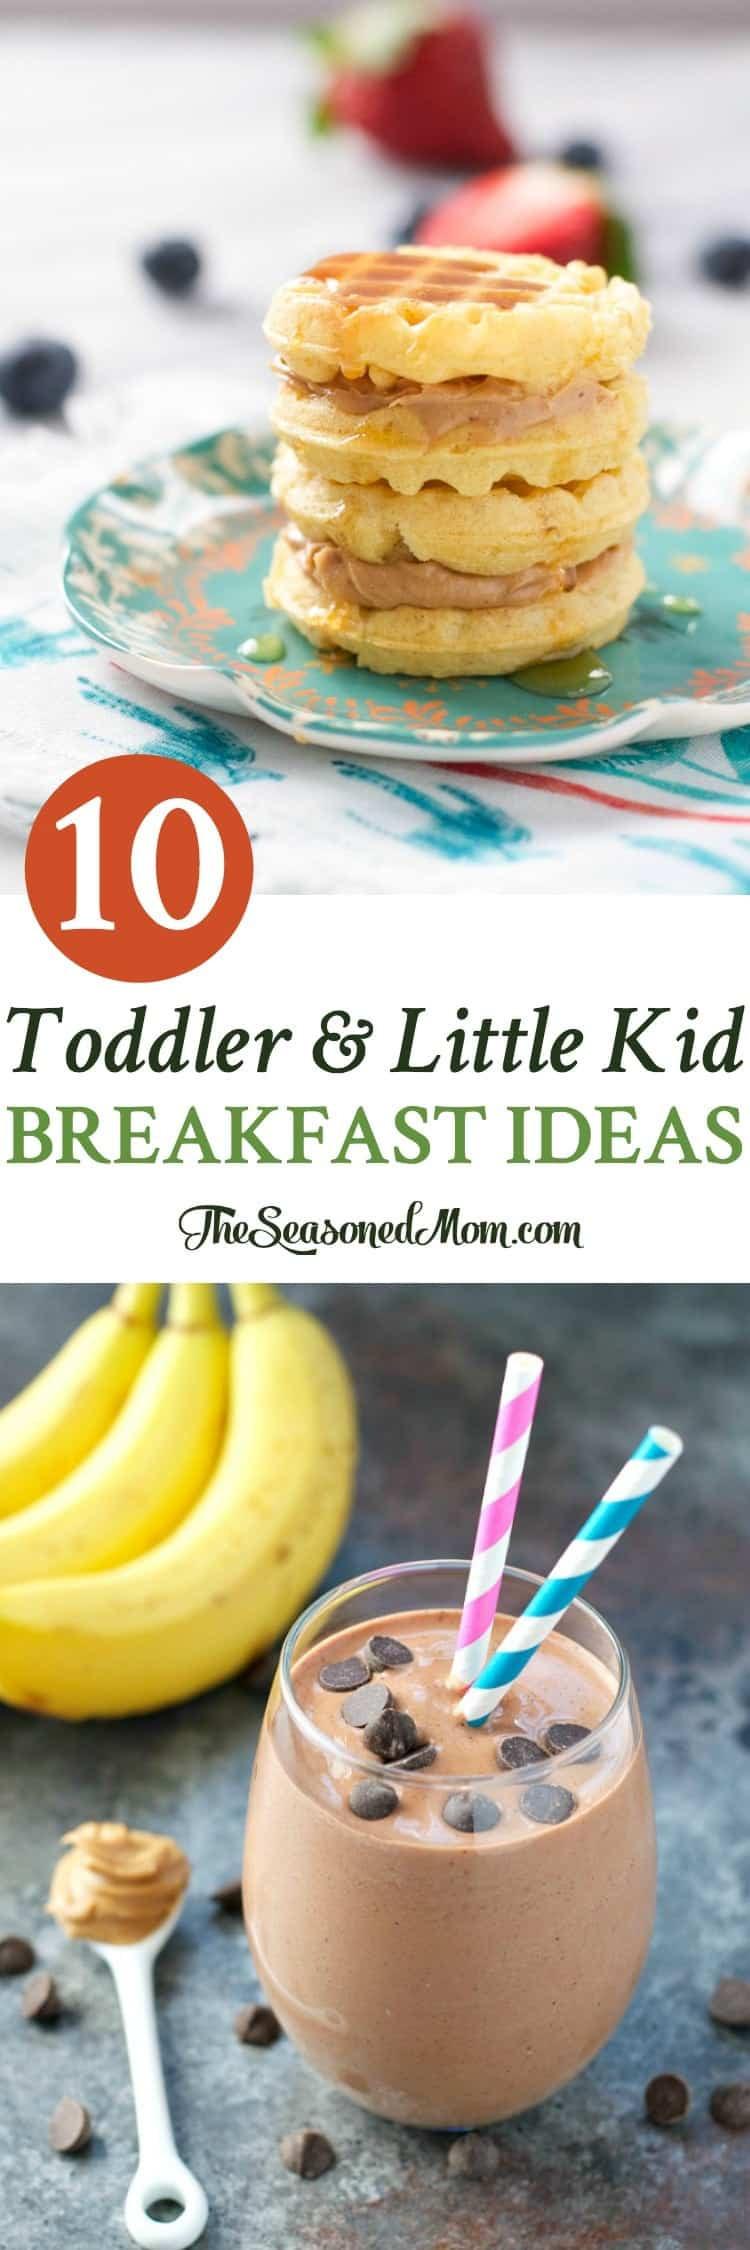 Best Breakfast For Kids 10 Toddler and Little Kid Breakfast Ideas The Seasoned Mom